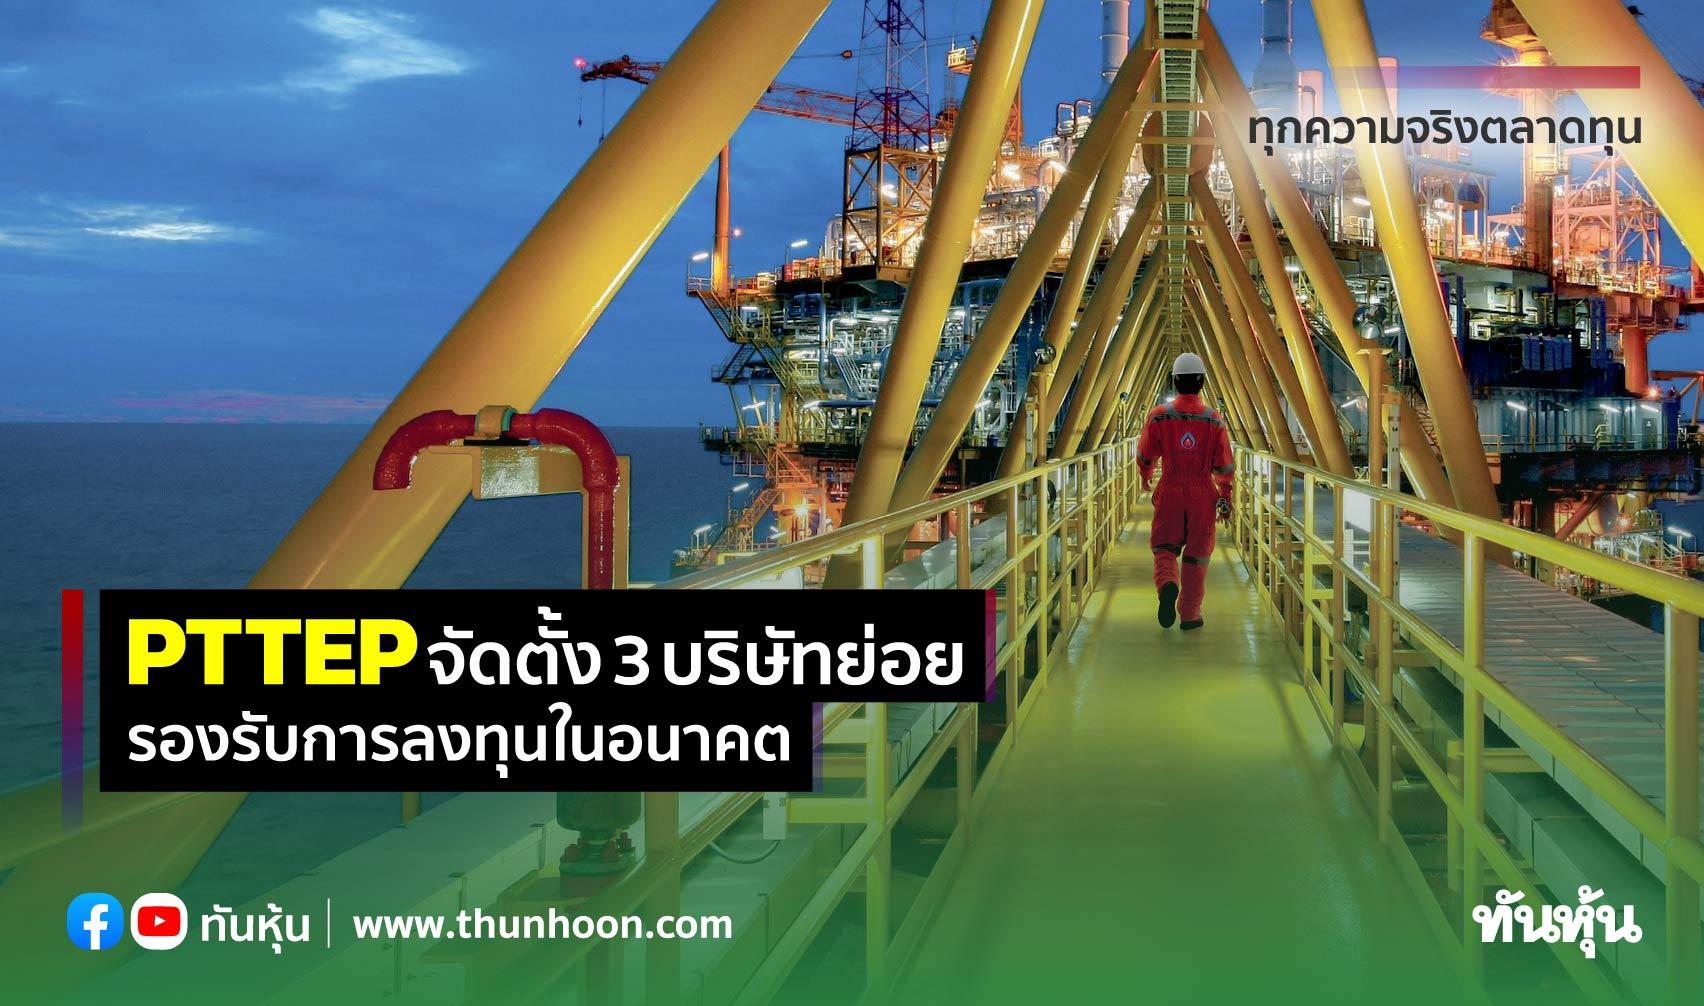 PTTEP จัดตั้ง 3 บริษัทย่อย รองรับการลงทุนในอนาคต